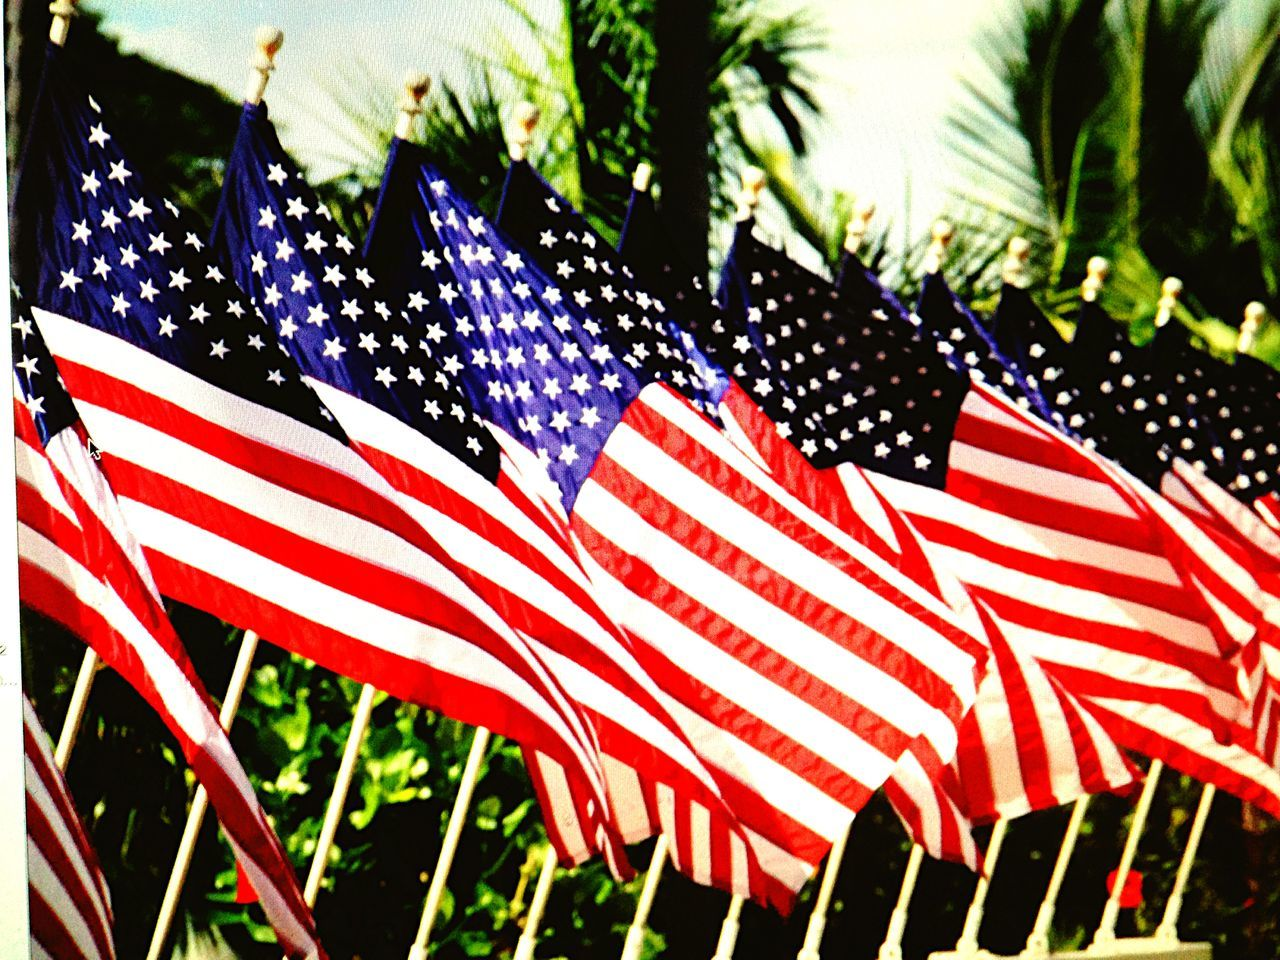 Portrait Of America - Flags RePicture Travel The Traveler - 2015 EyeEm Awards The Moment - 2015 EyeEm Awards